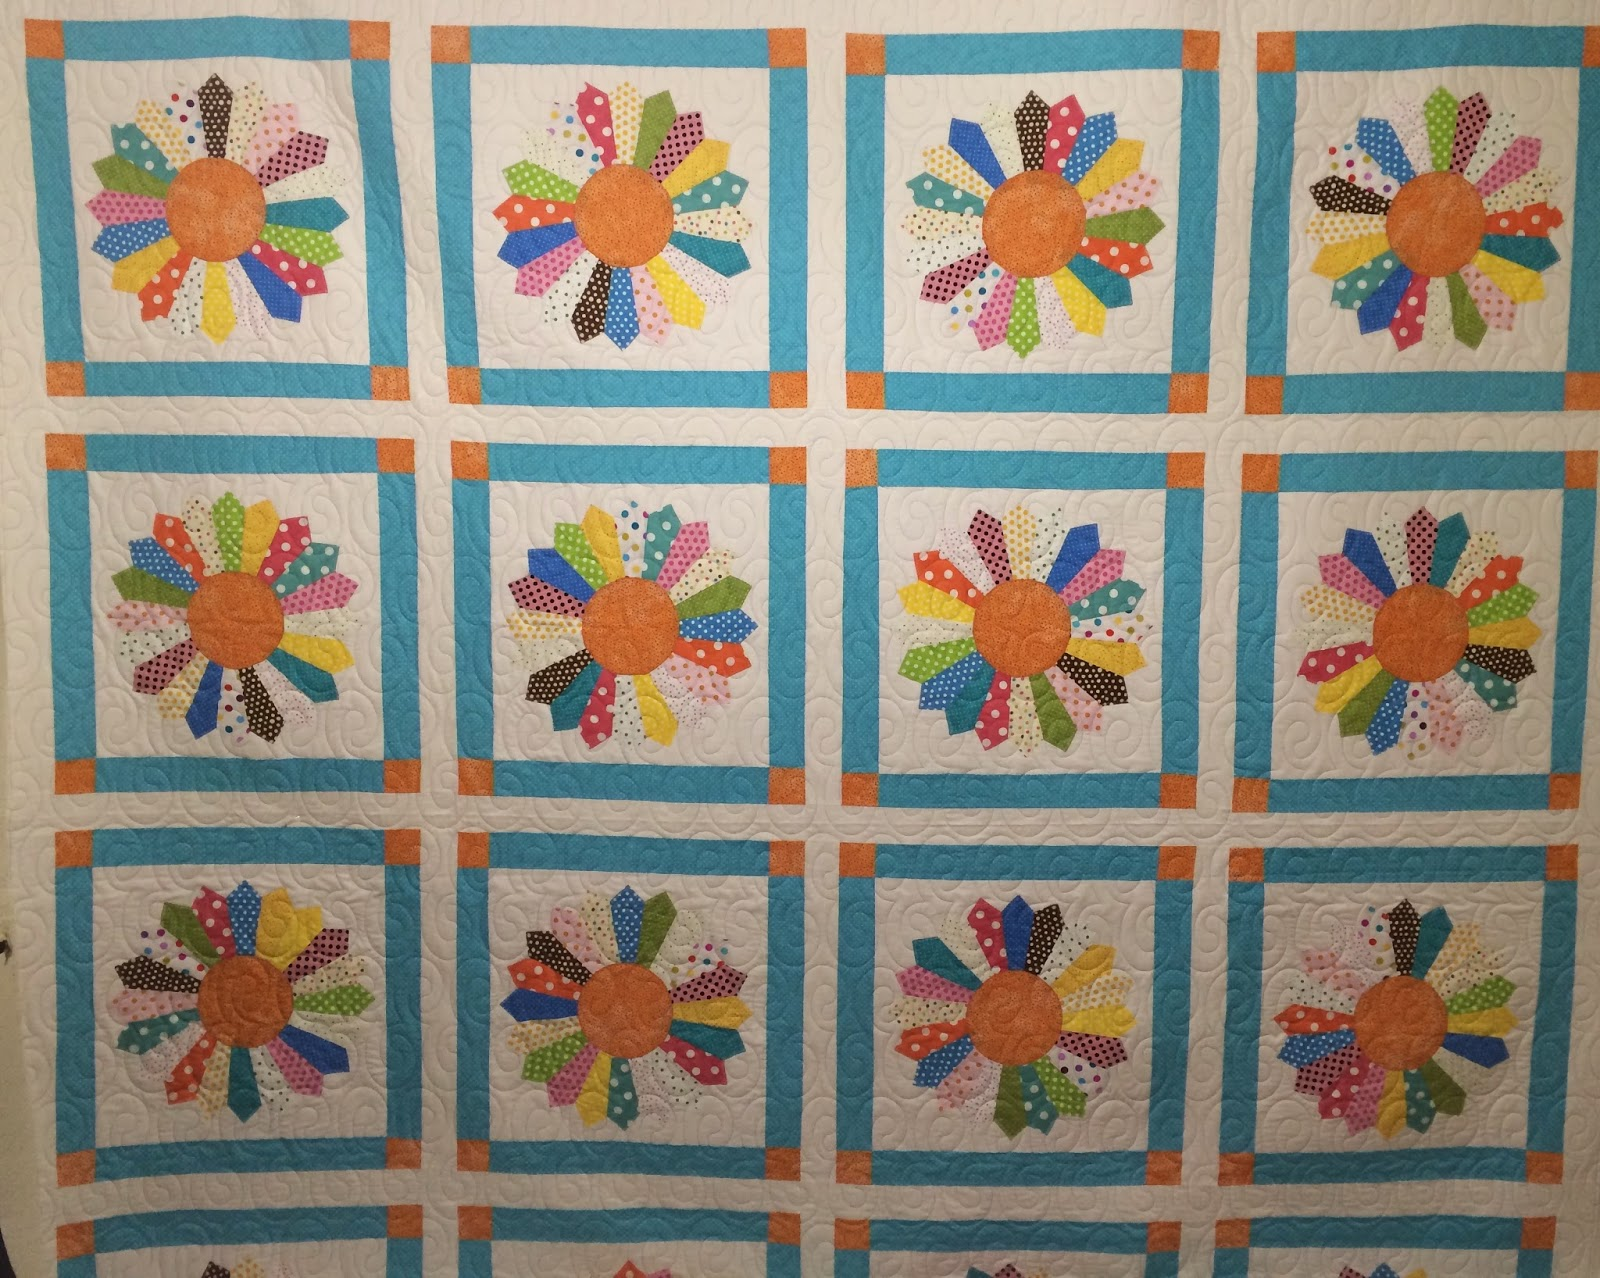 Nancy Thornton's Dresden Plate Quilt